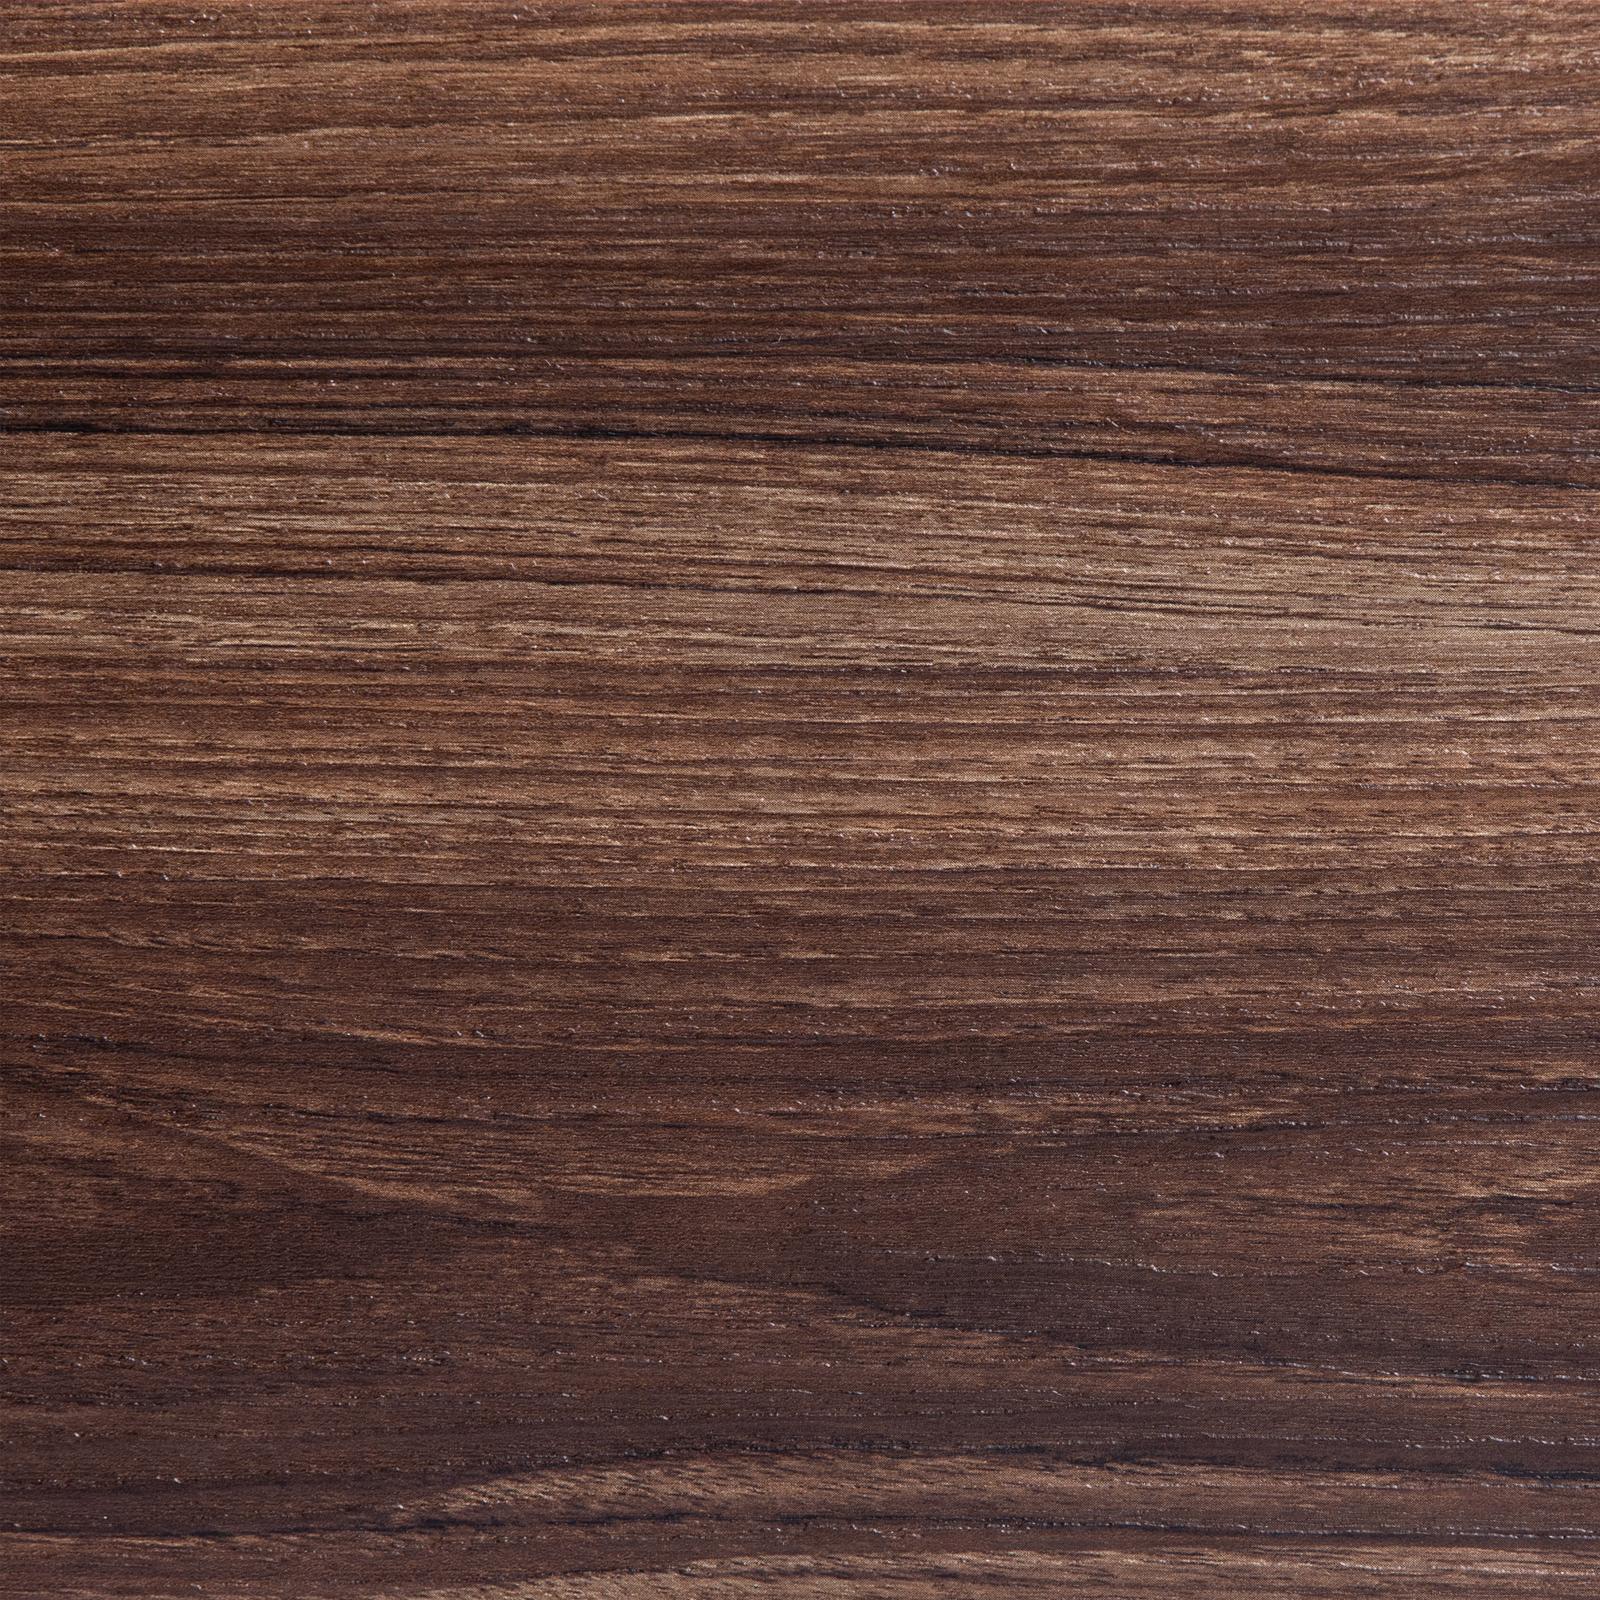 Ustik 1220 x 184 x 5mm 2.24m2  Winter Oak Peel And Stick Vinyl Plank - 10 Planks